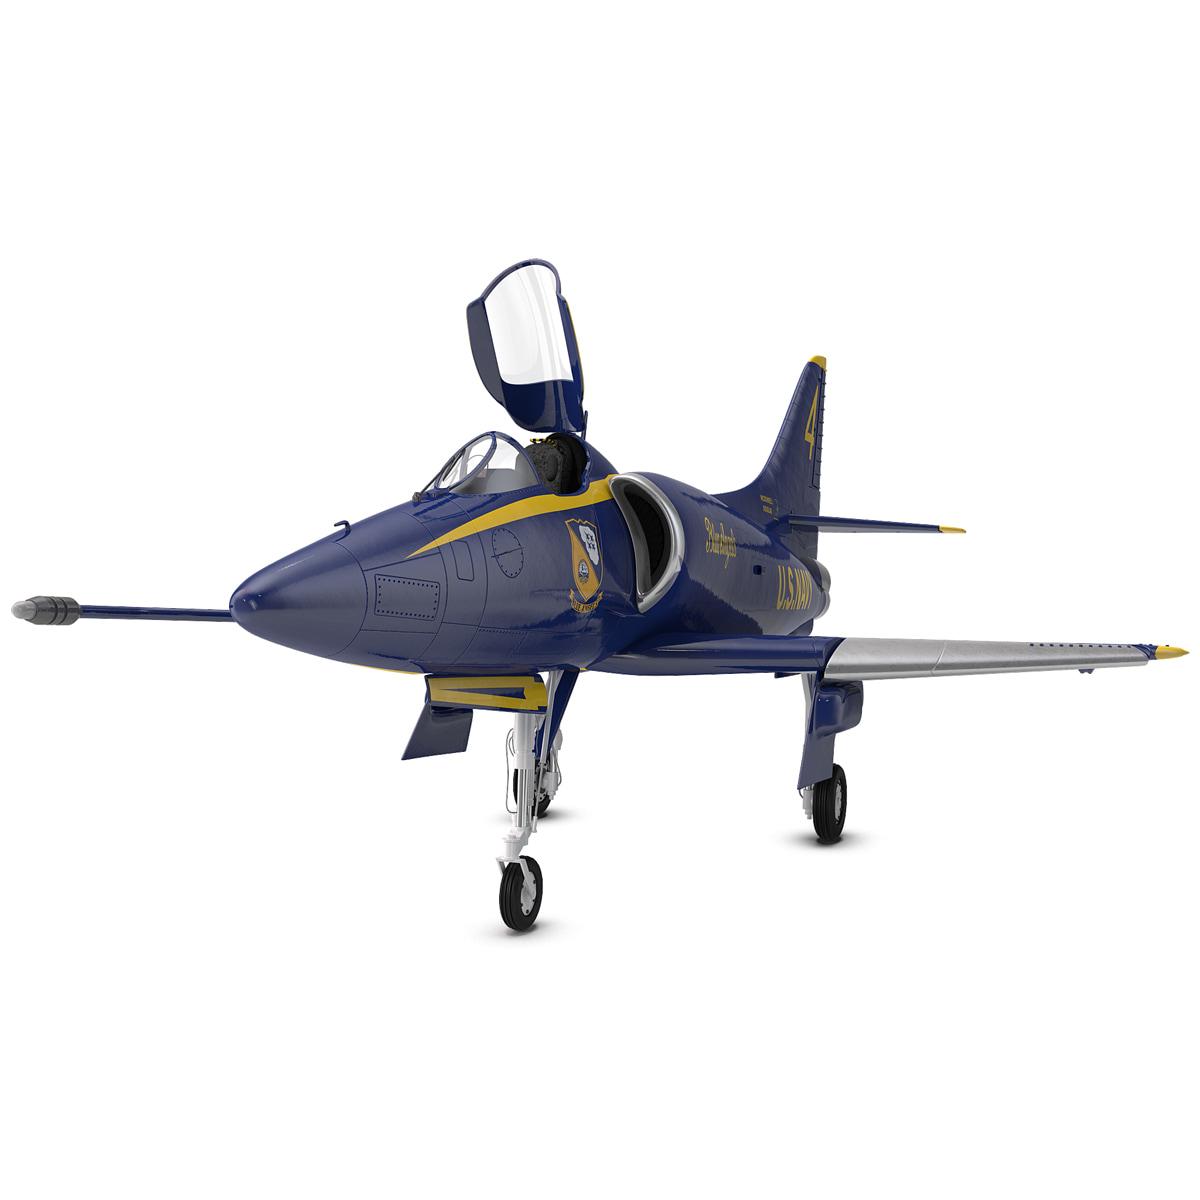 Attack Aircraft A-4 Skyhawk Blue Angel Rigged